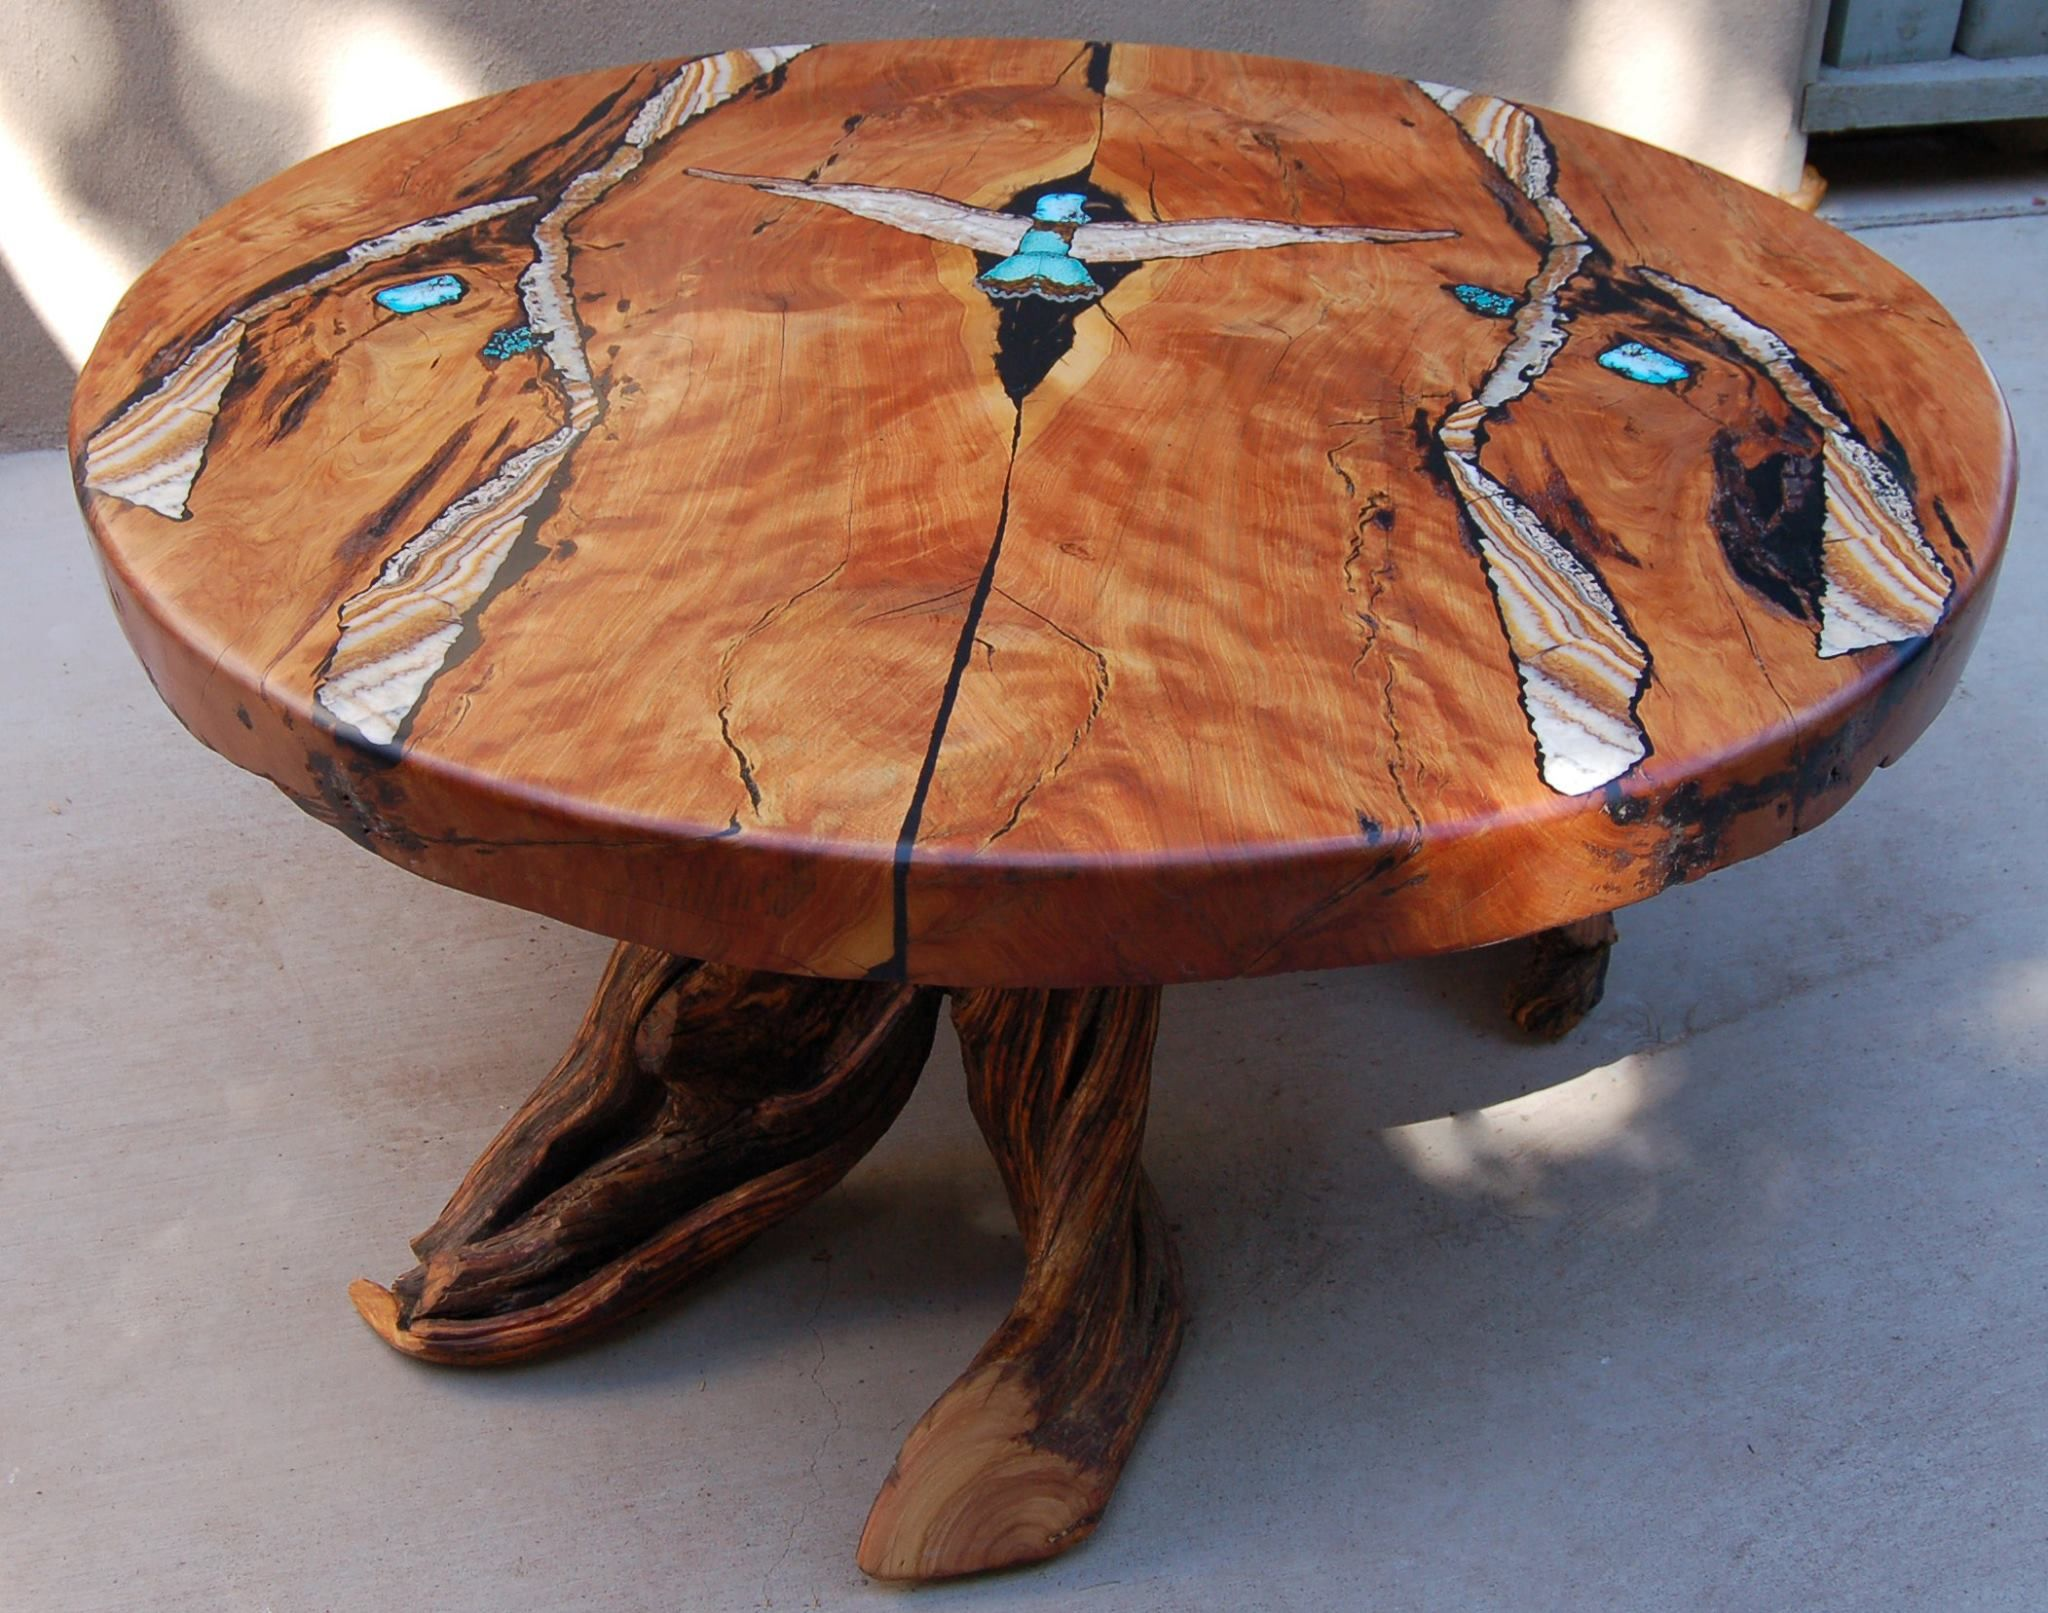 "Thunderbird"" coffee table by Andy & Aaron Sanchez near Santa Fe"